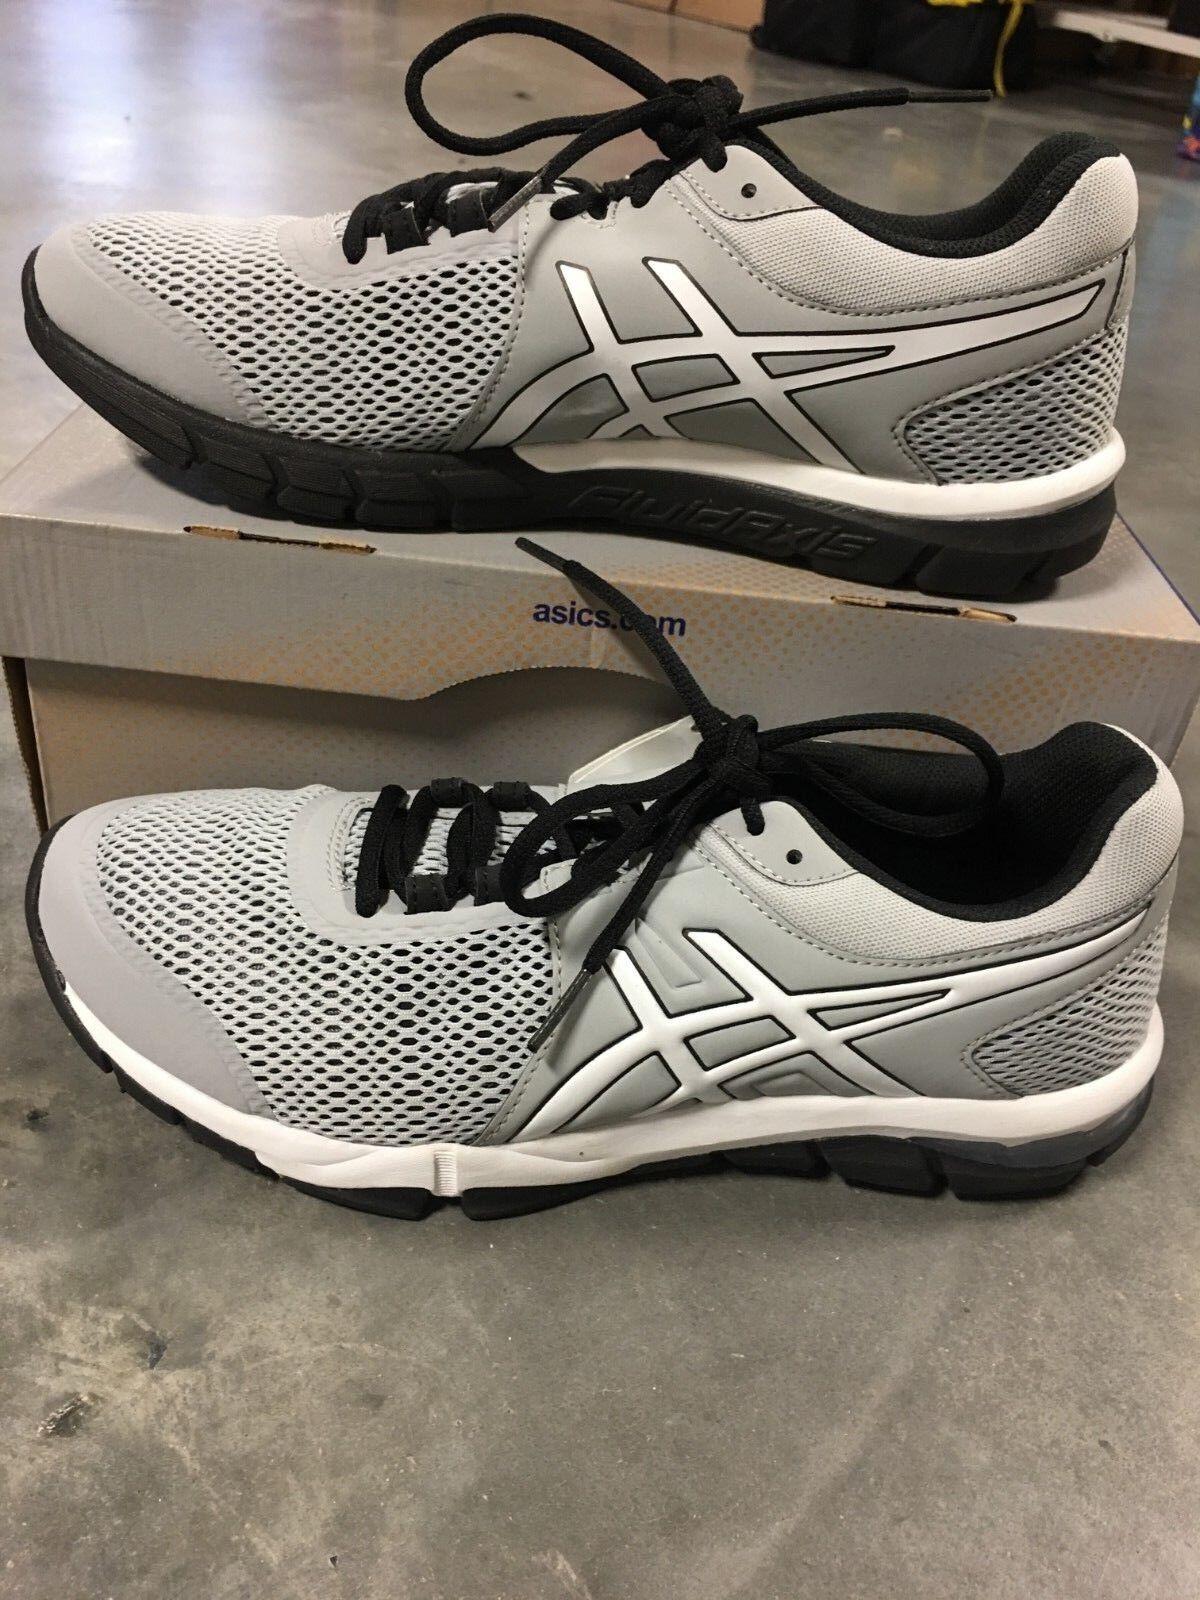 ASICS Gel-Craze TR 4 Men's 9 M US shoes; color Mid Grey, White, Black  RETURN